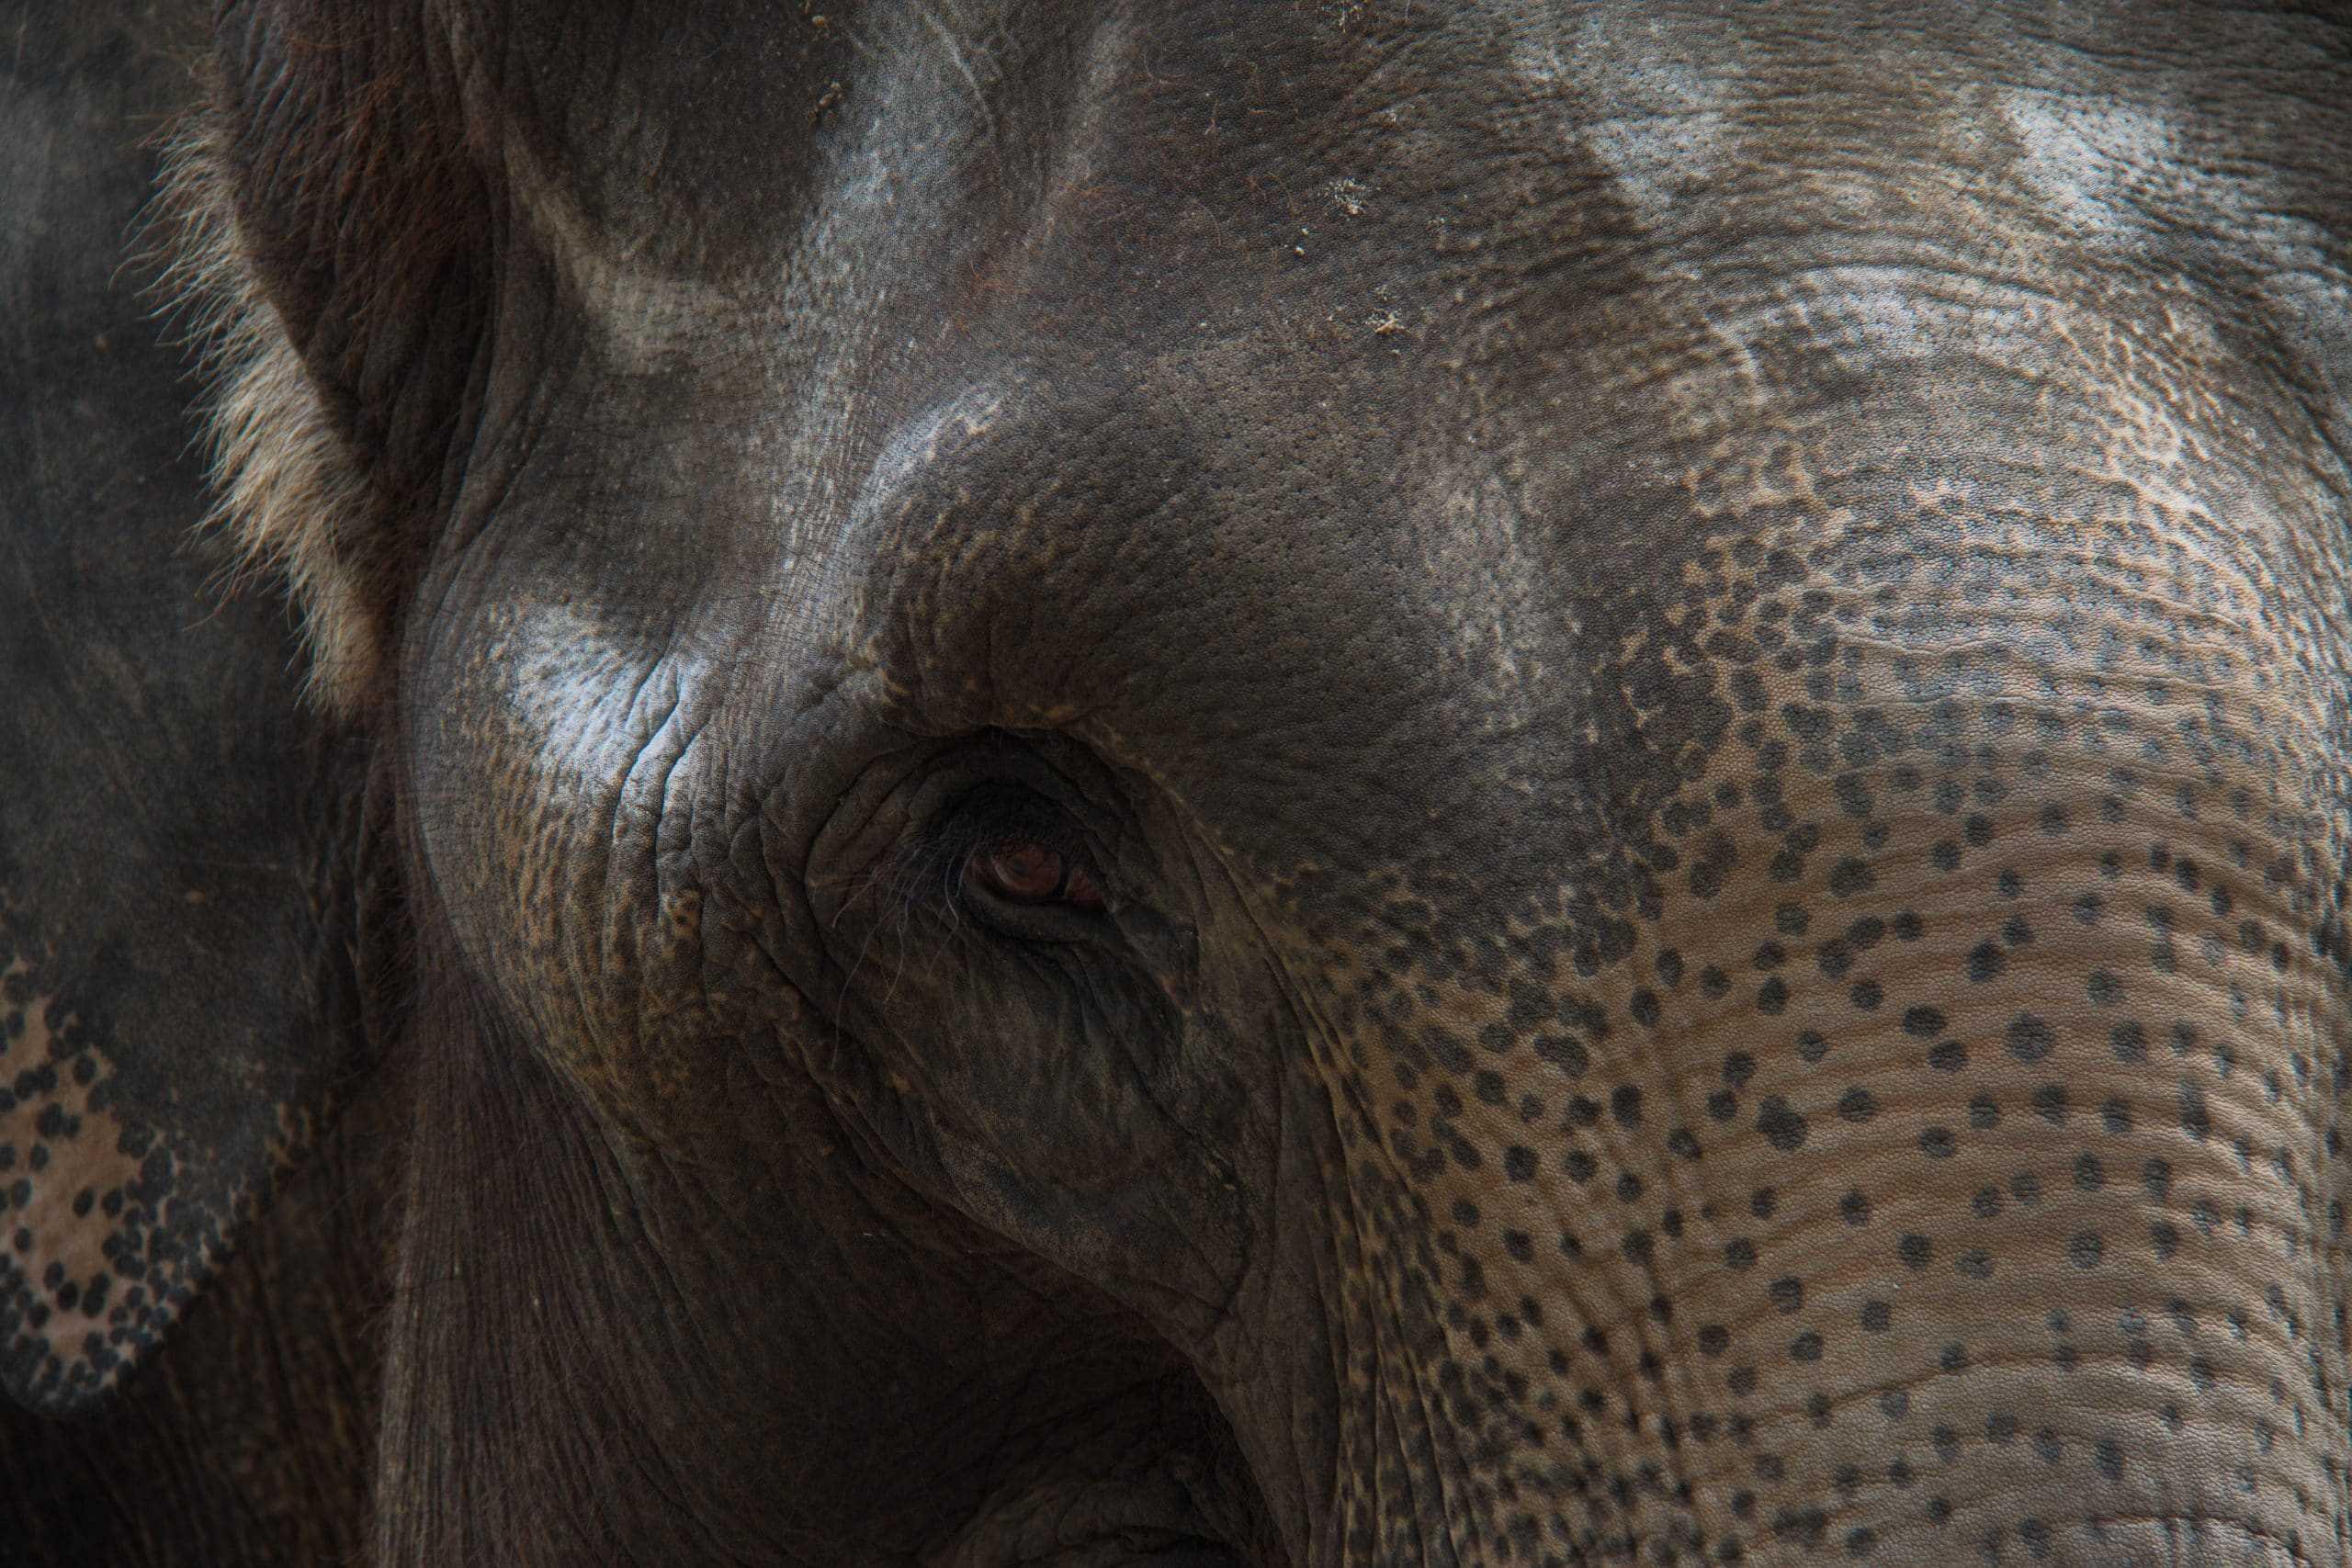 Elefantenporträt